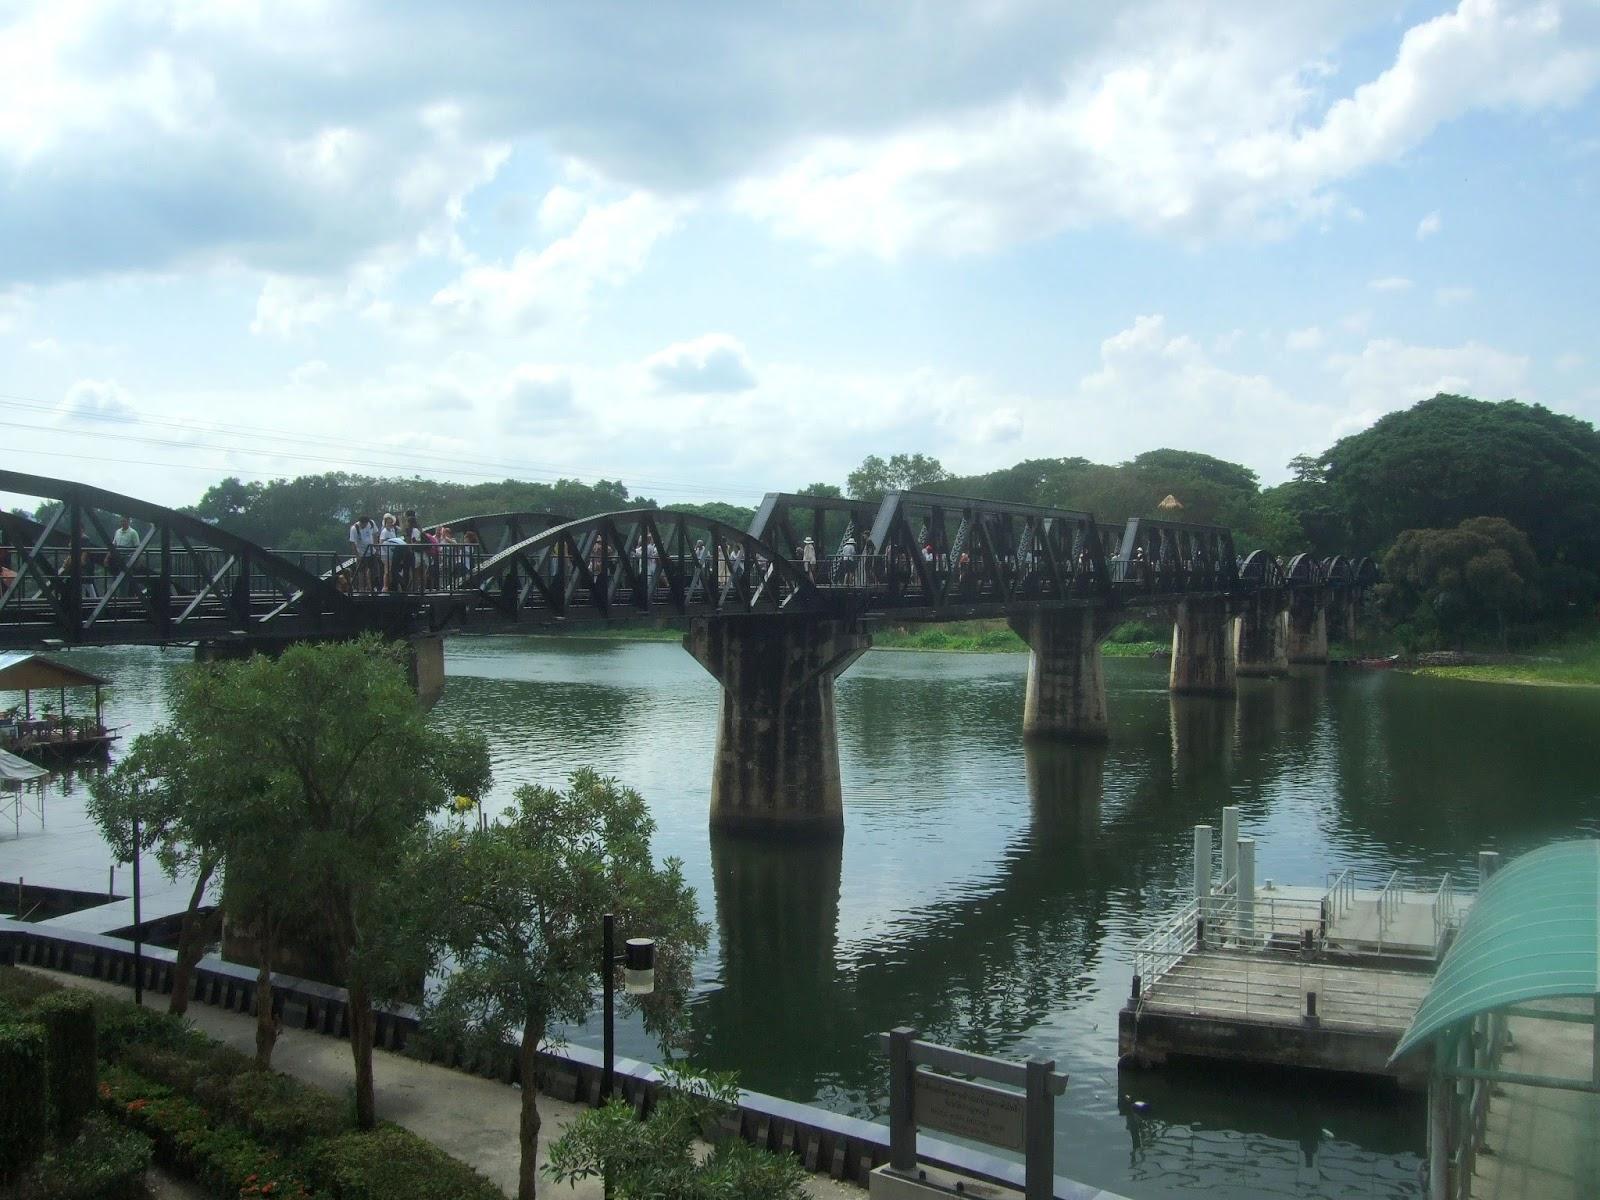 bridge on the river - photo #10